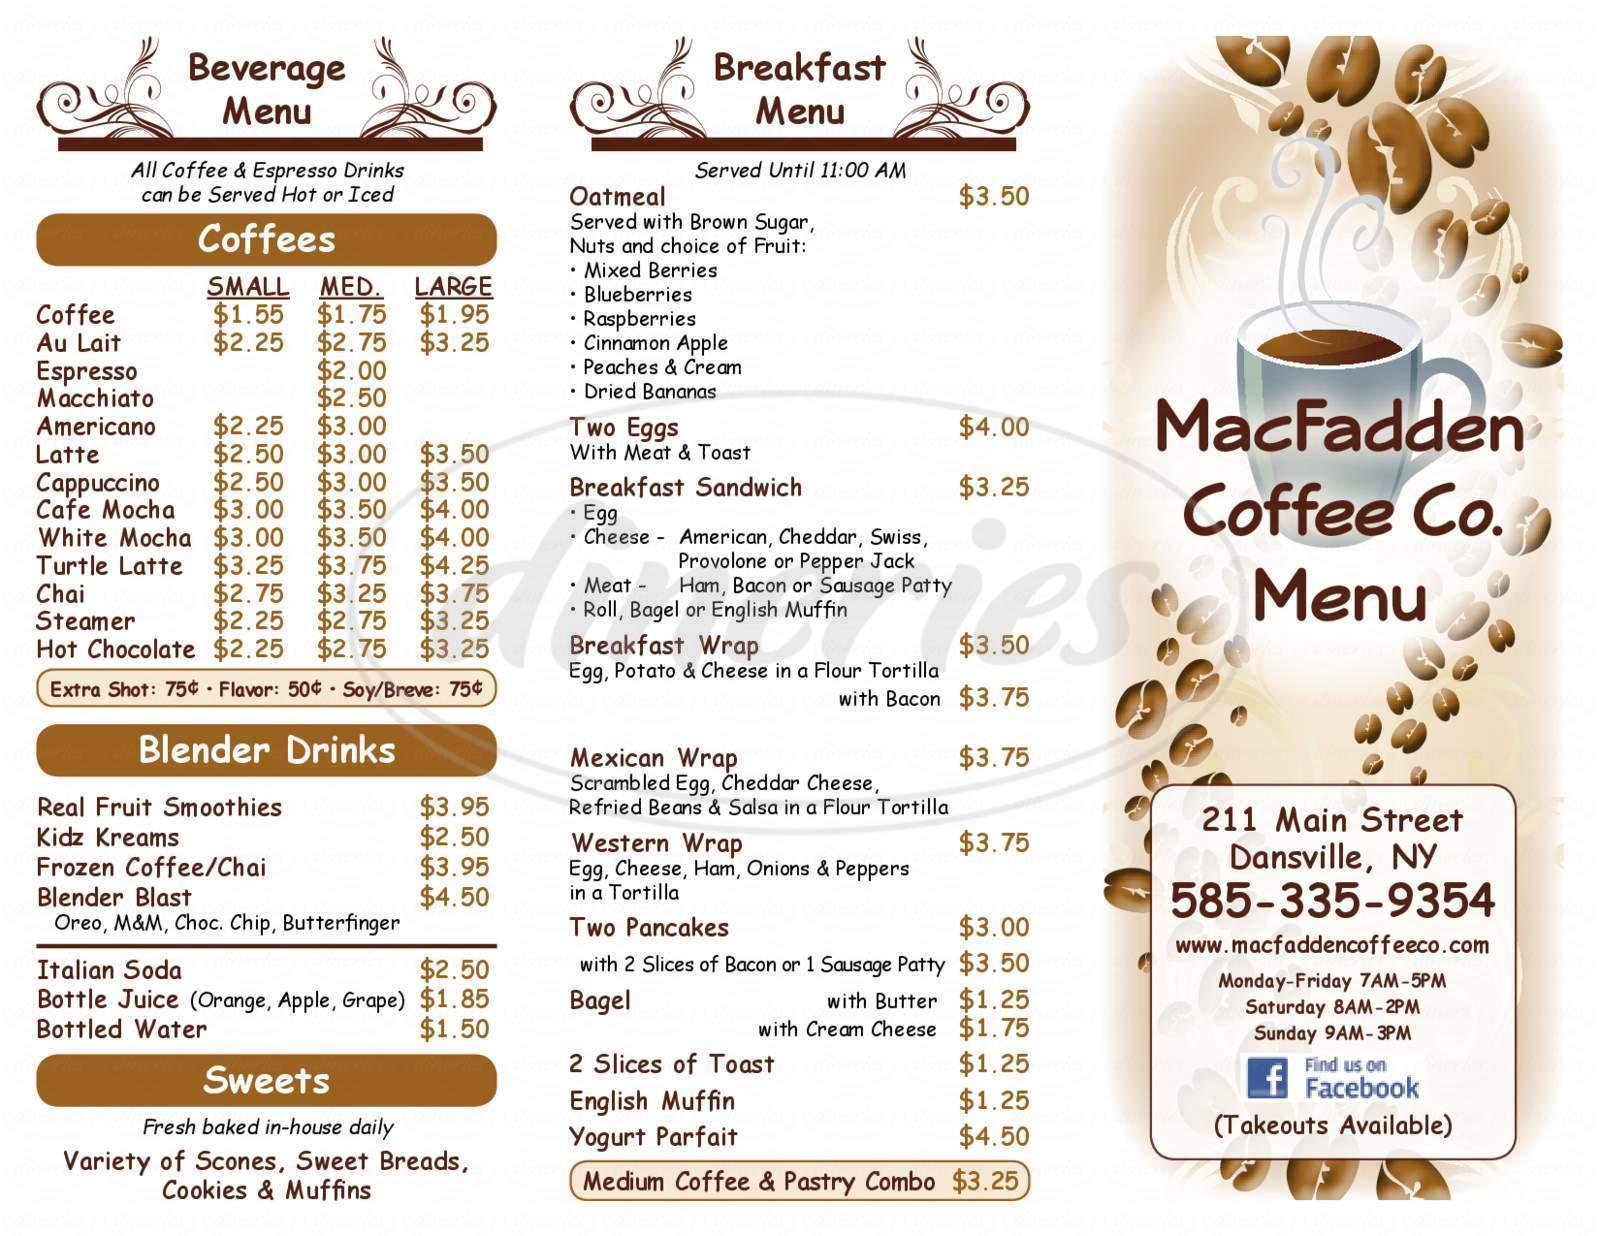 menu for MacFadden Coffee Co.